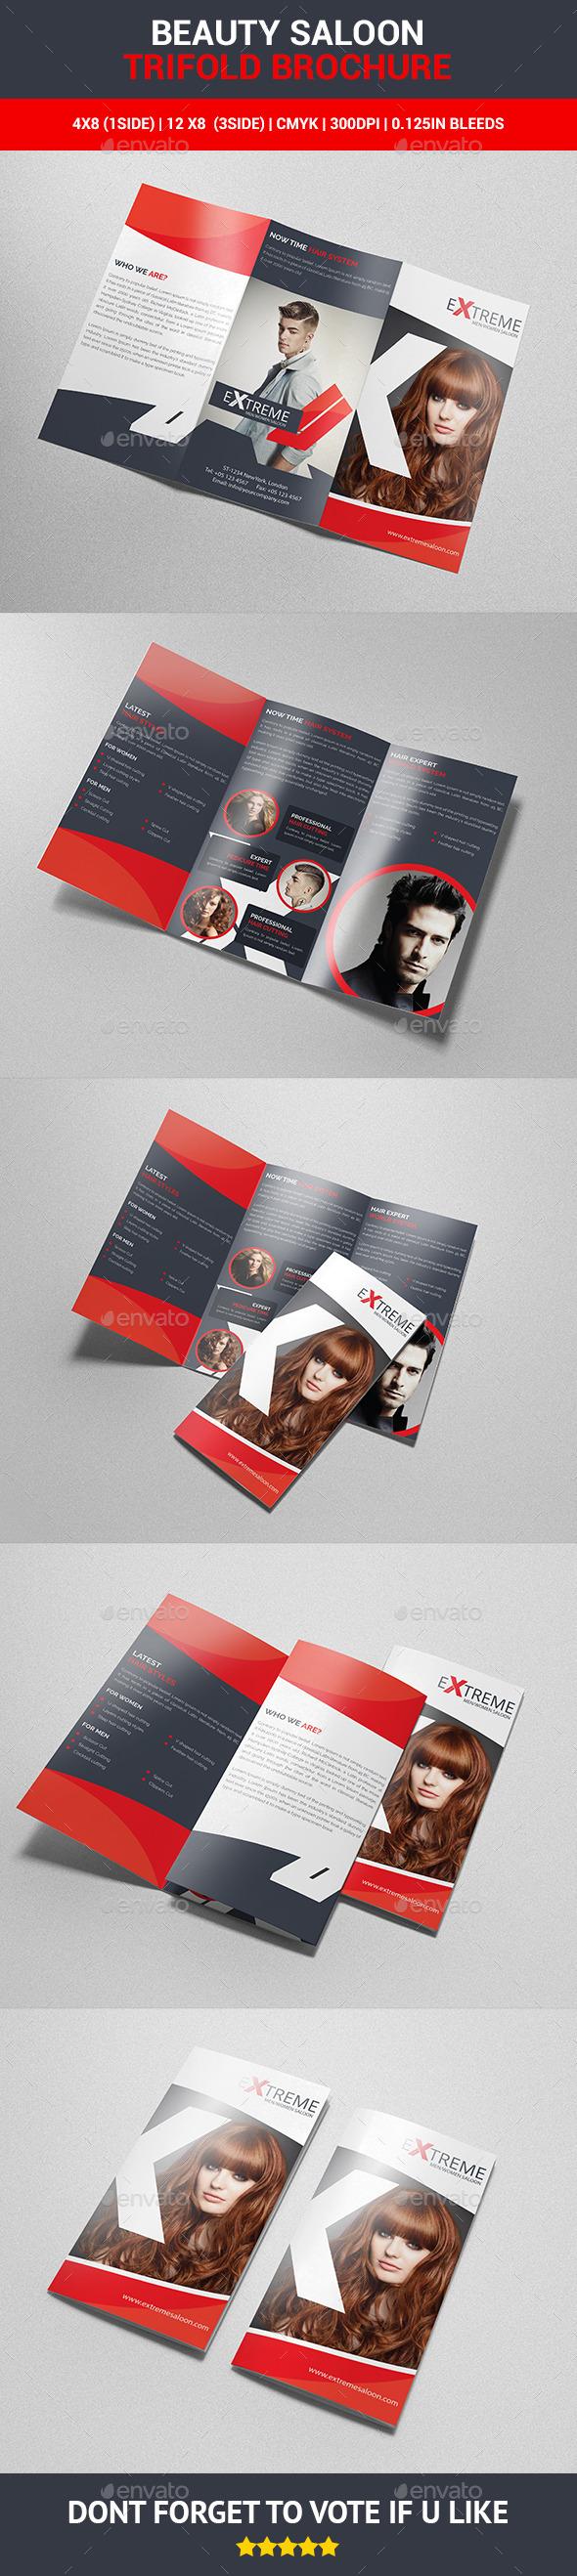 Beauty Saloon Trifold Brochure - Corporate Brochures